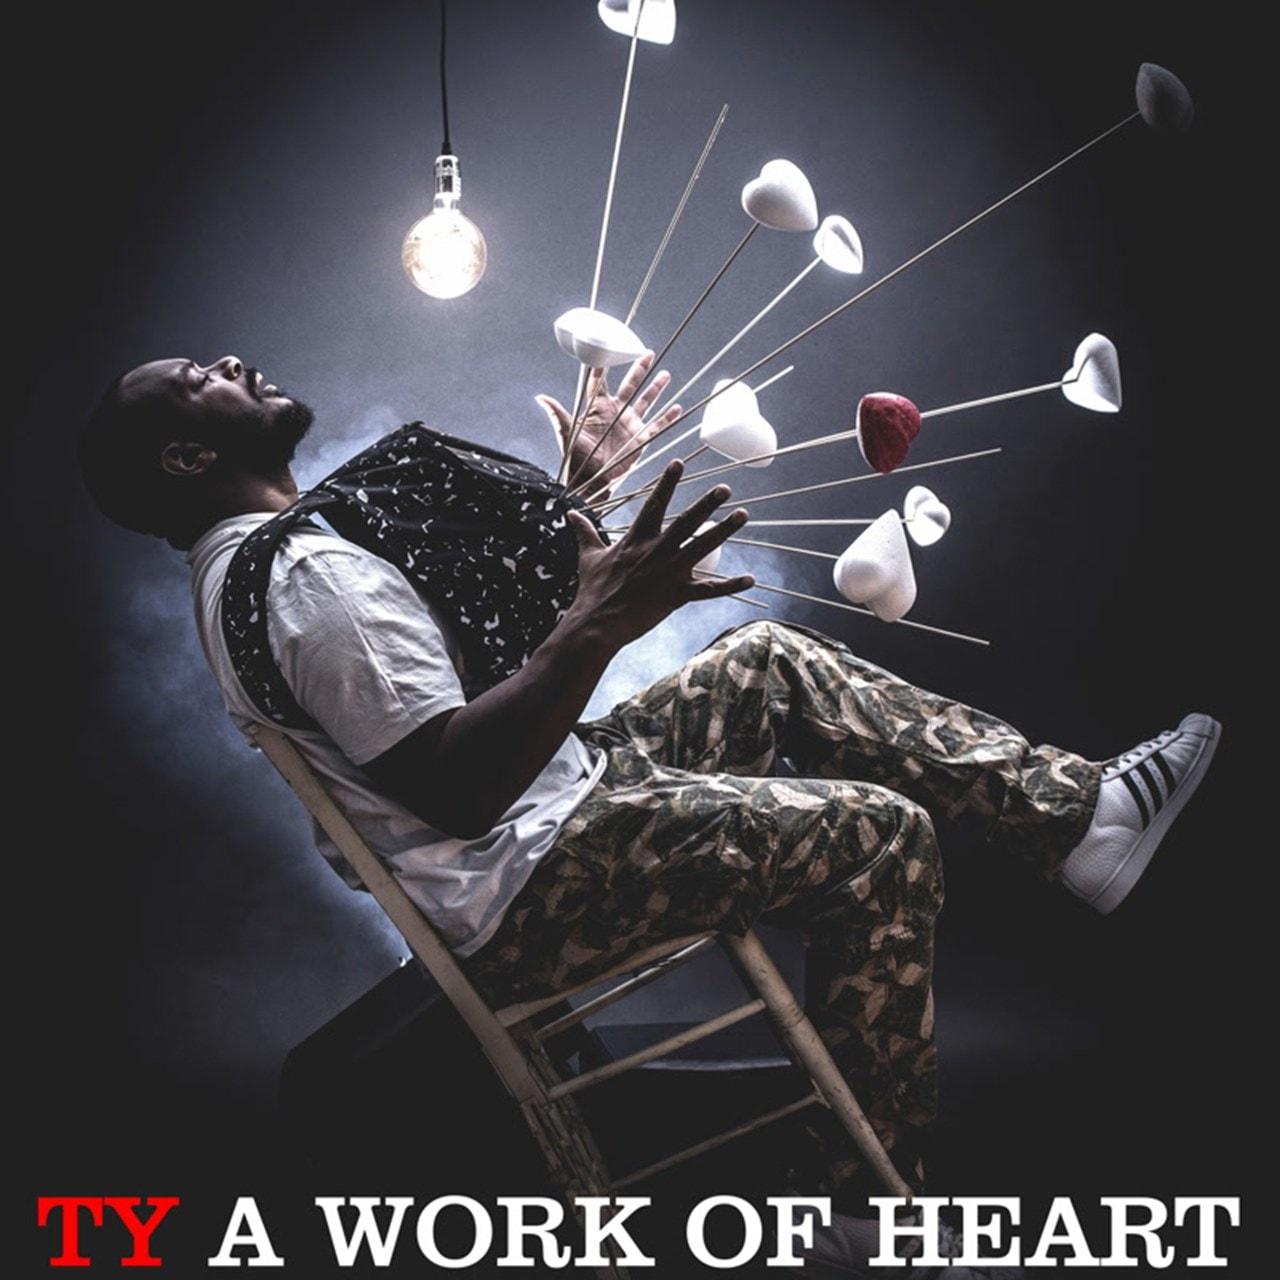 A Work of Heart - 1